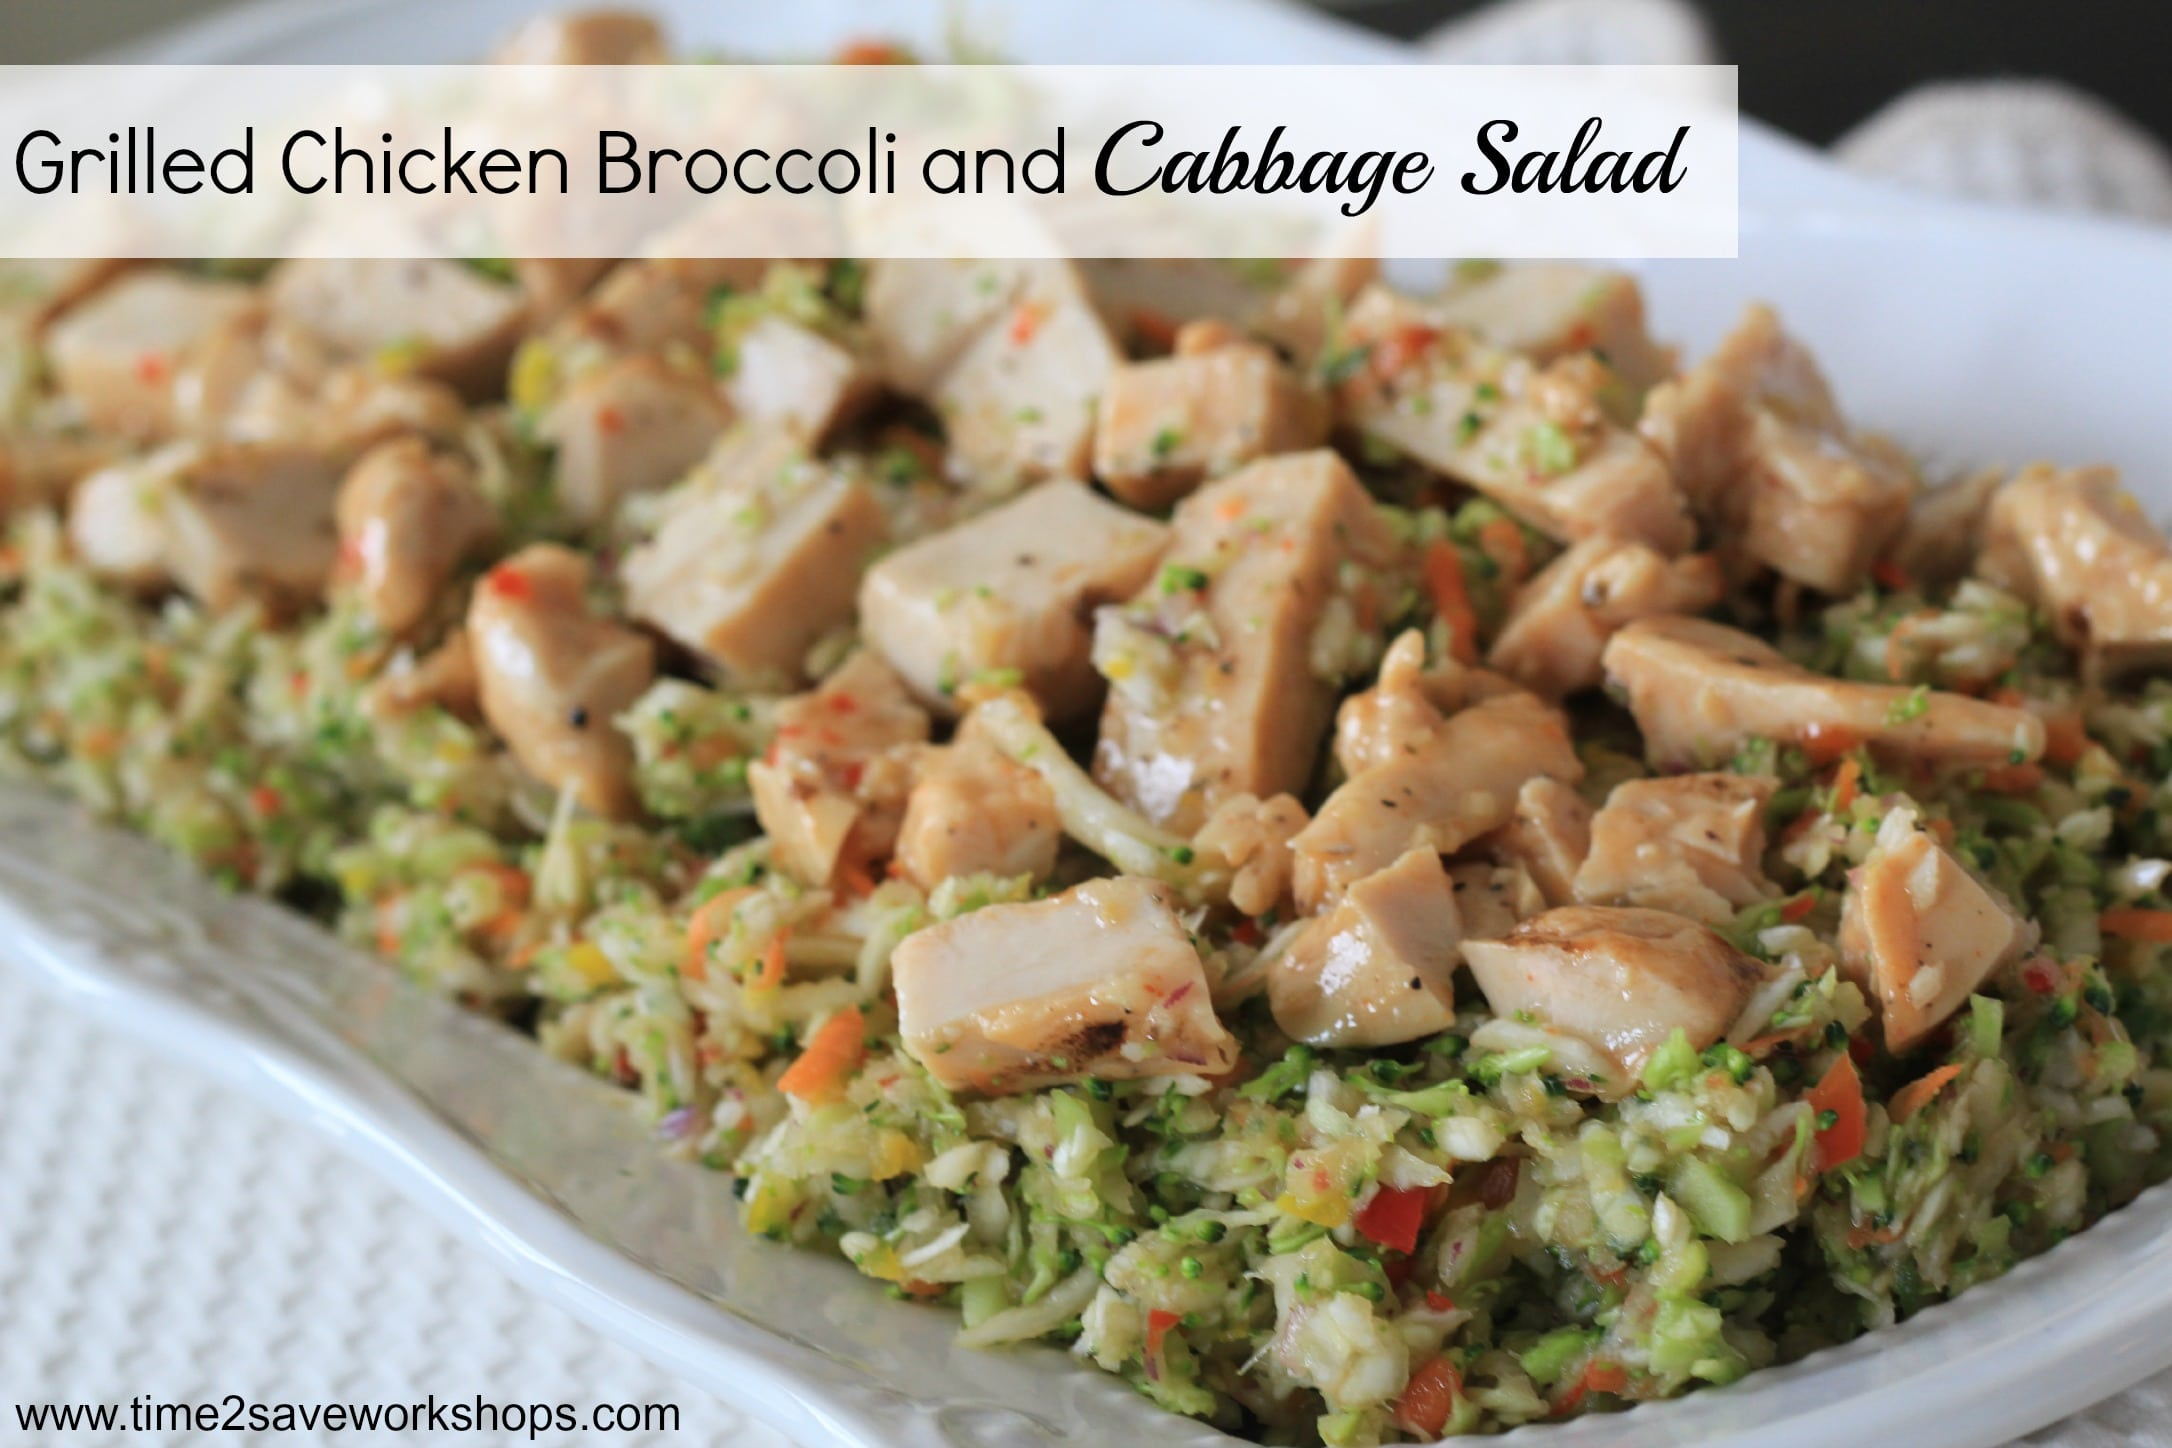 Grilled Chicken Broccoli & Cabbage Salad